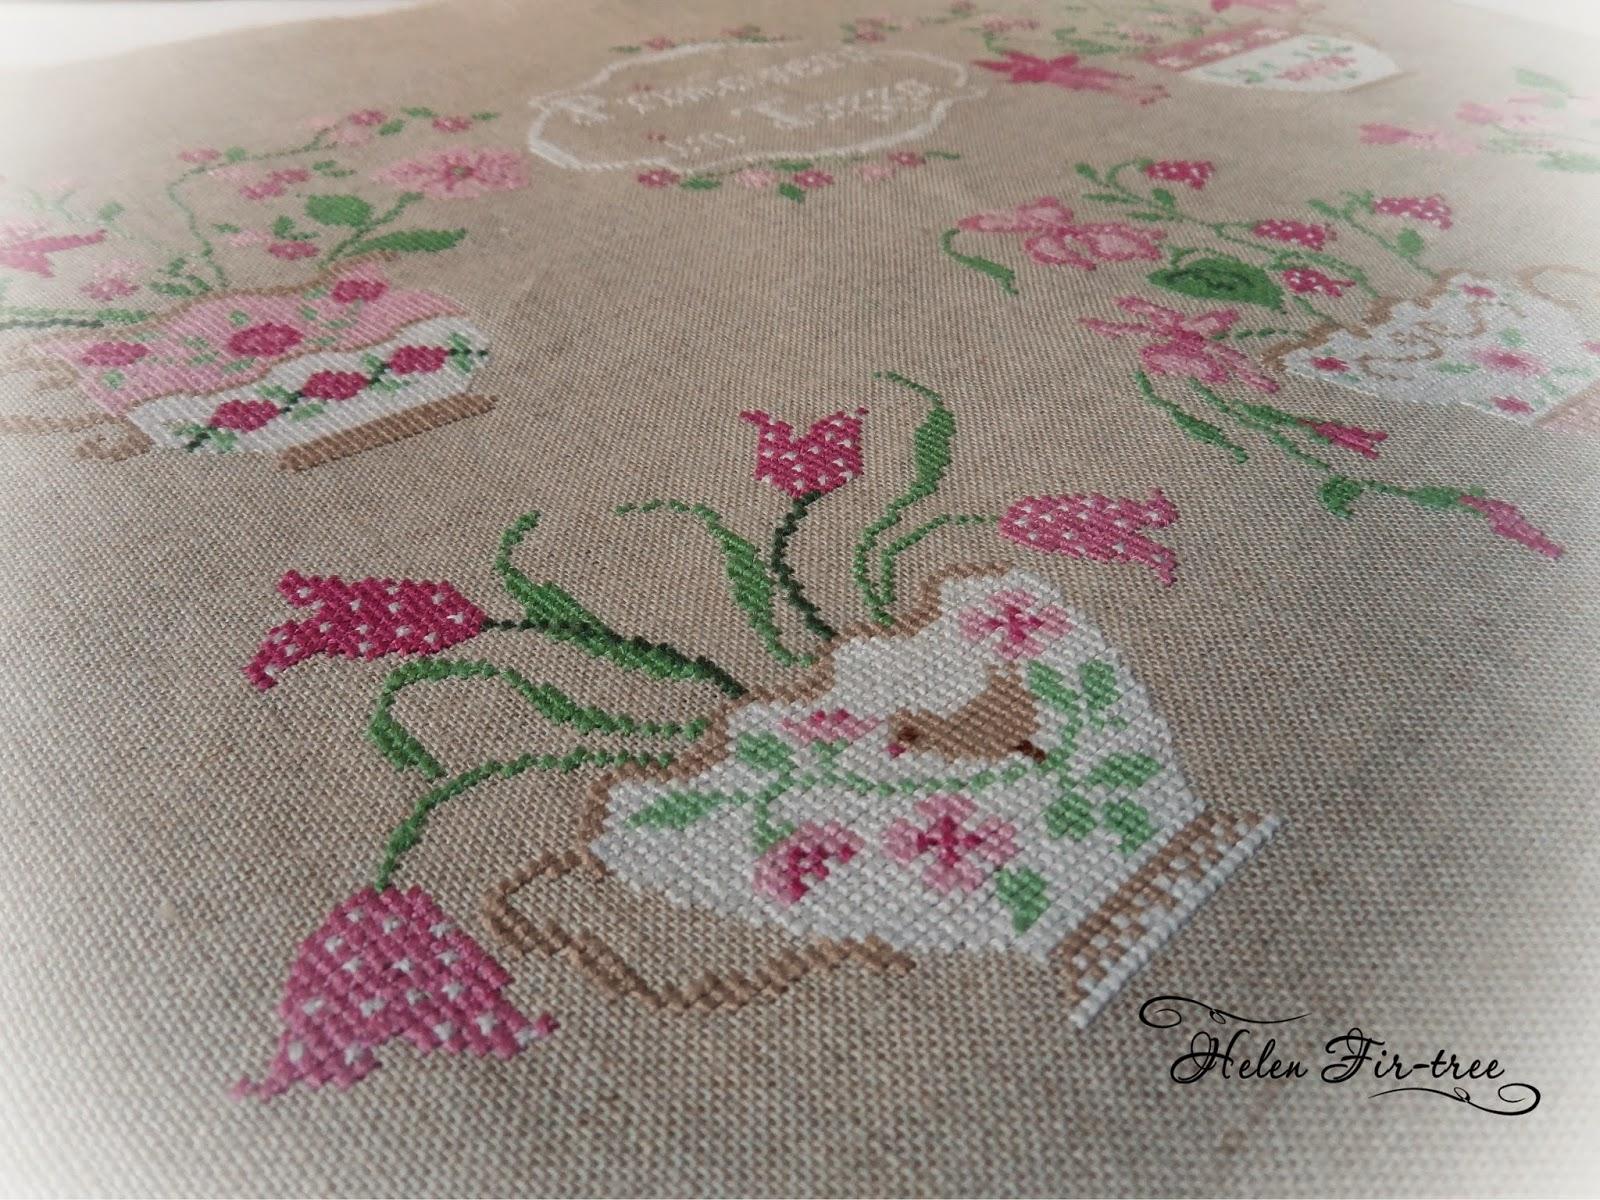 Helen Fir-tree вышивка крестом cross-stitch Primavera in Tassa